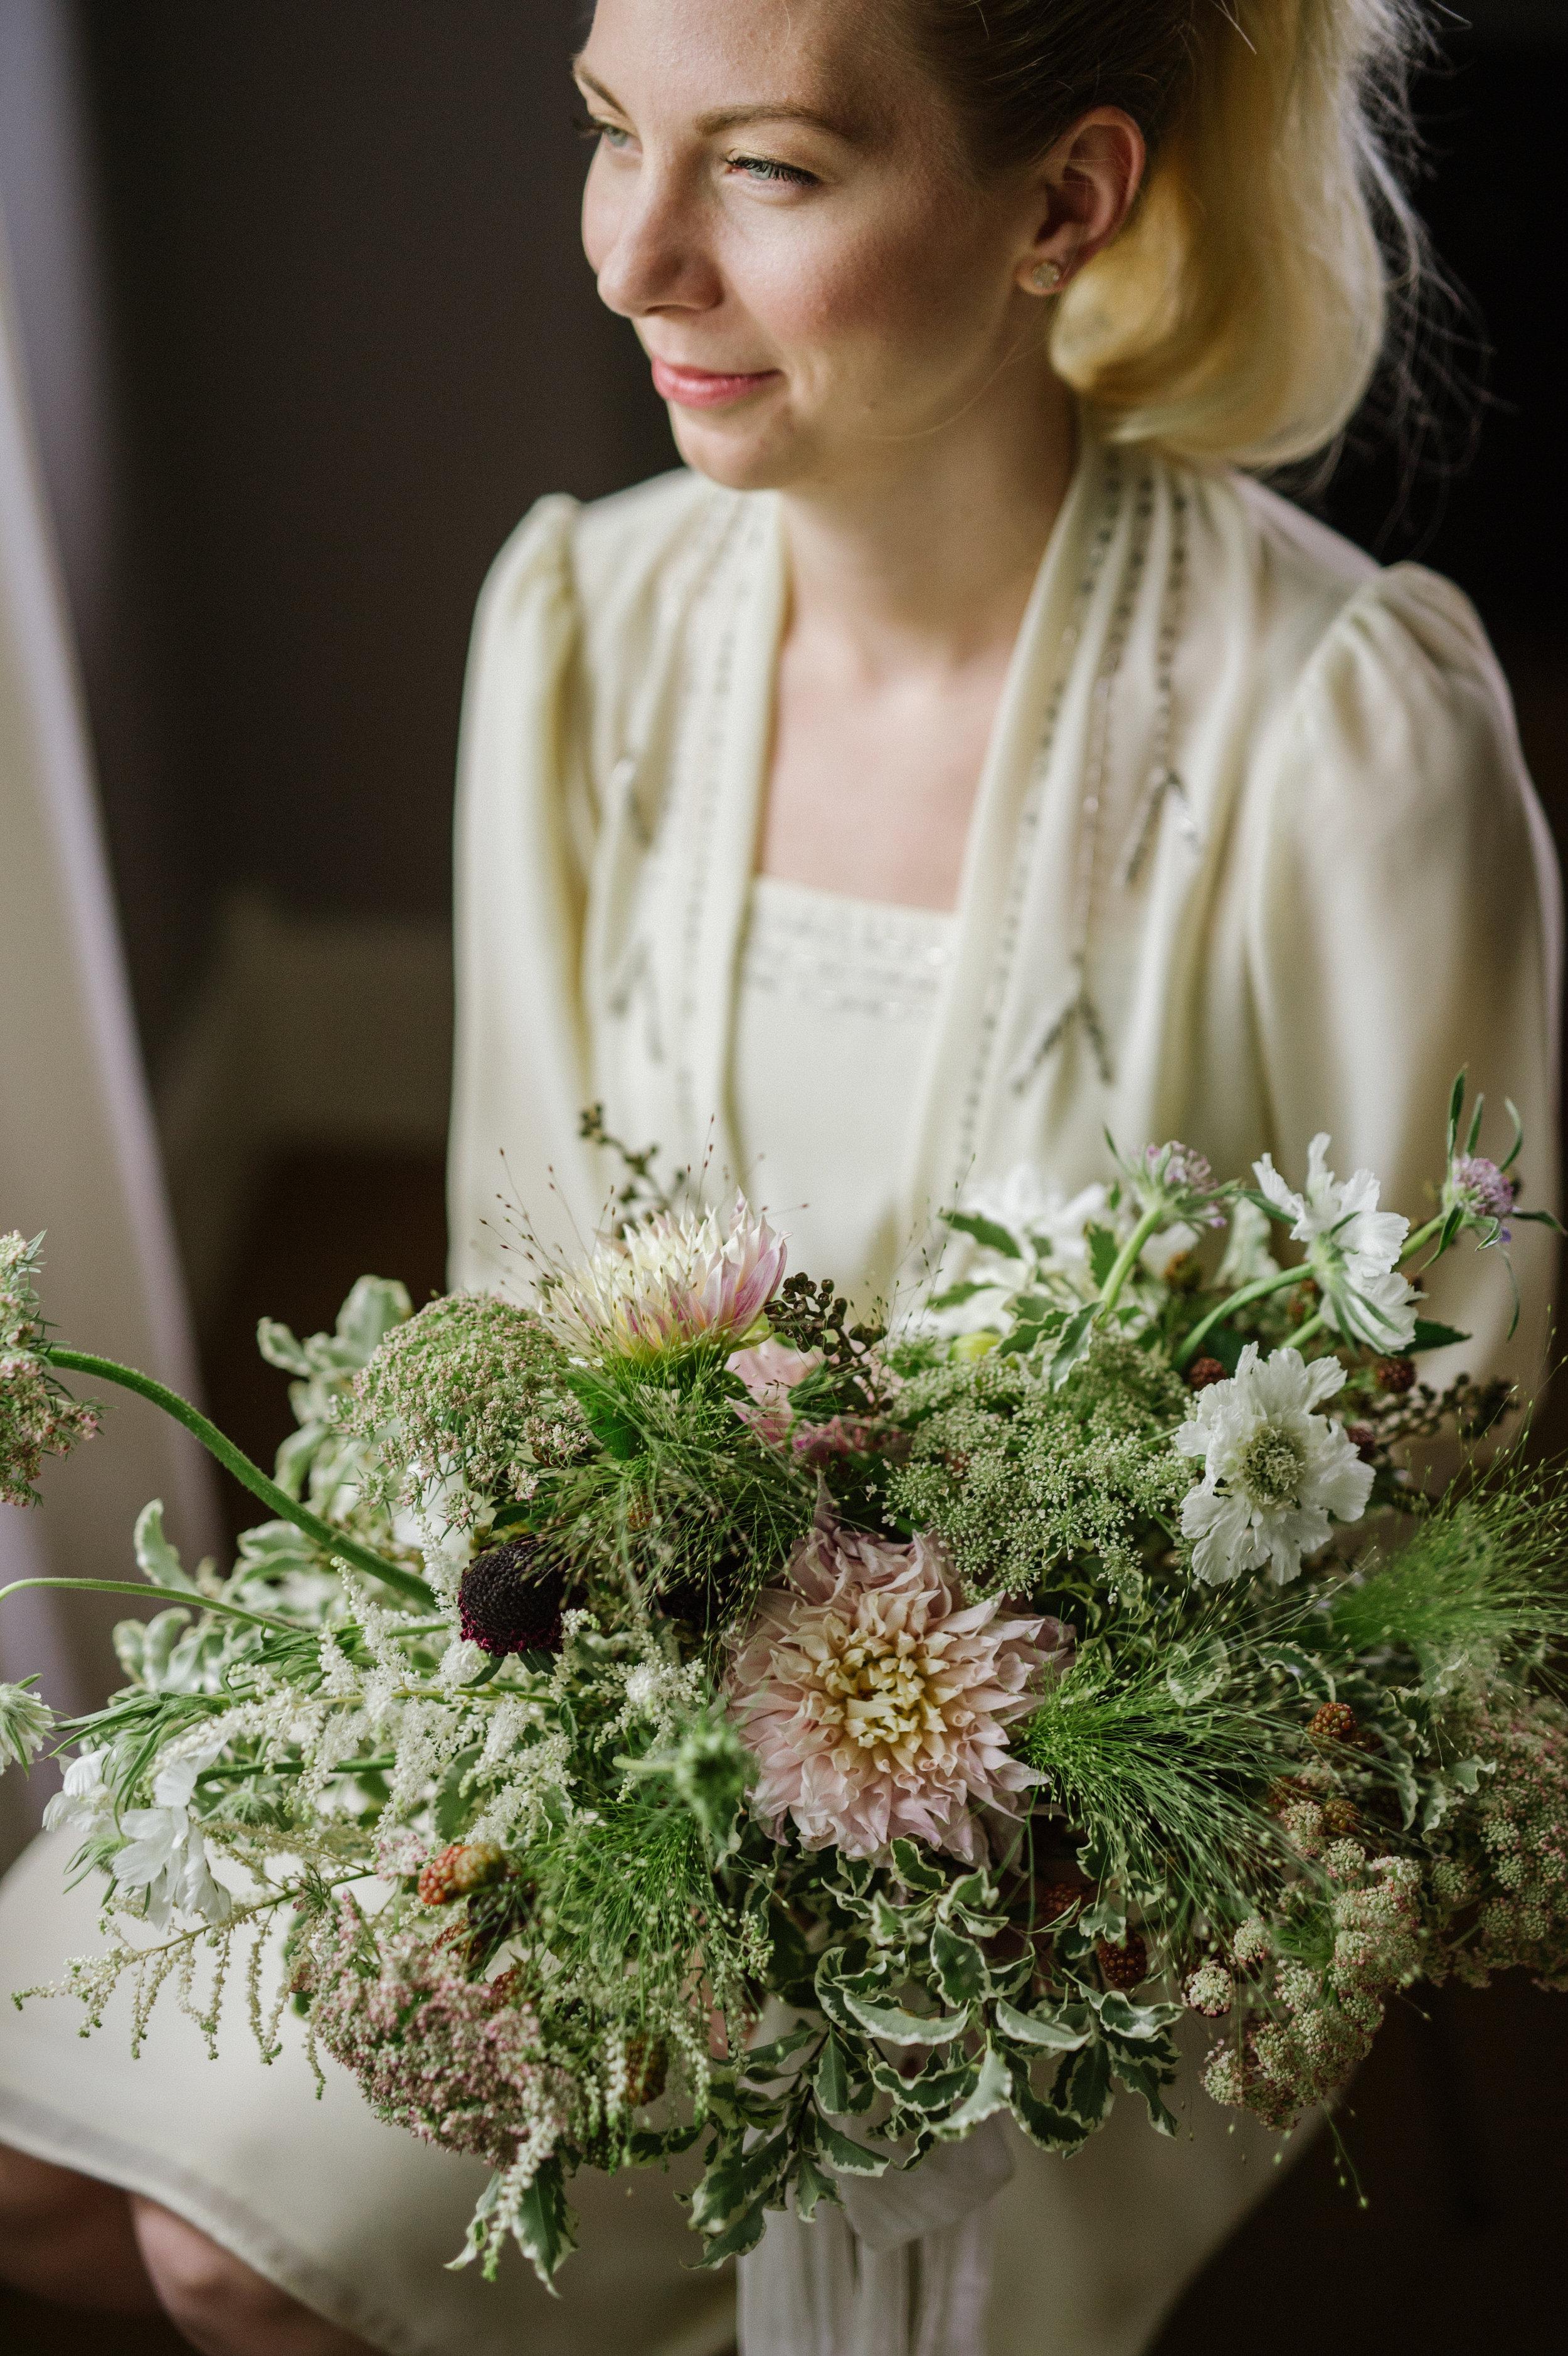 Teatro_Wedding_Calgary_Wedding_Photography_Vanessa_Tom_Married_2018_HR004.jpg